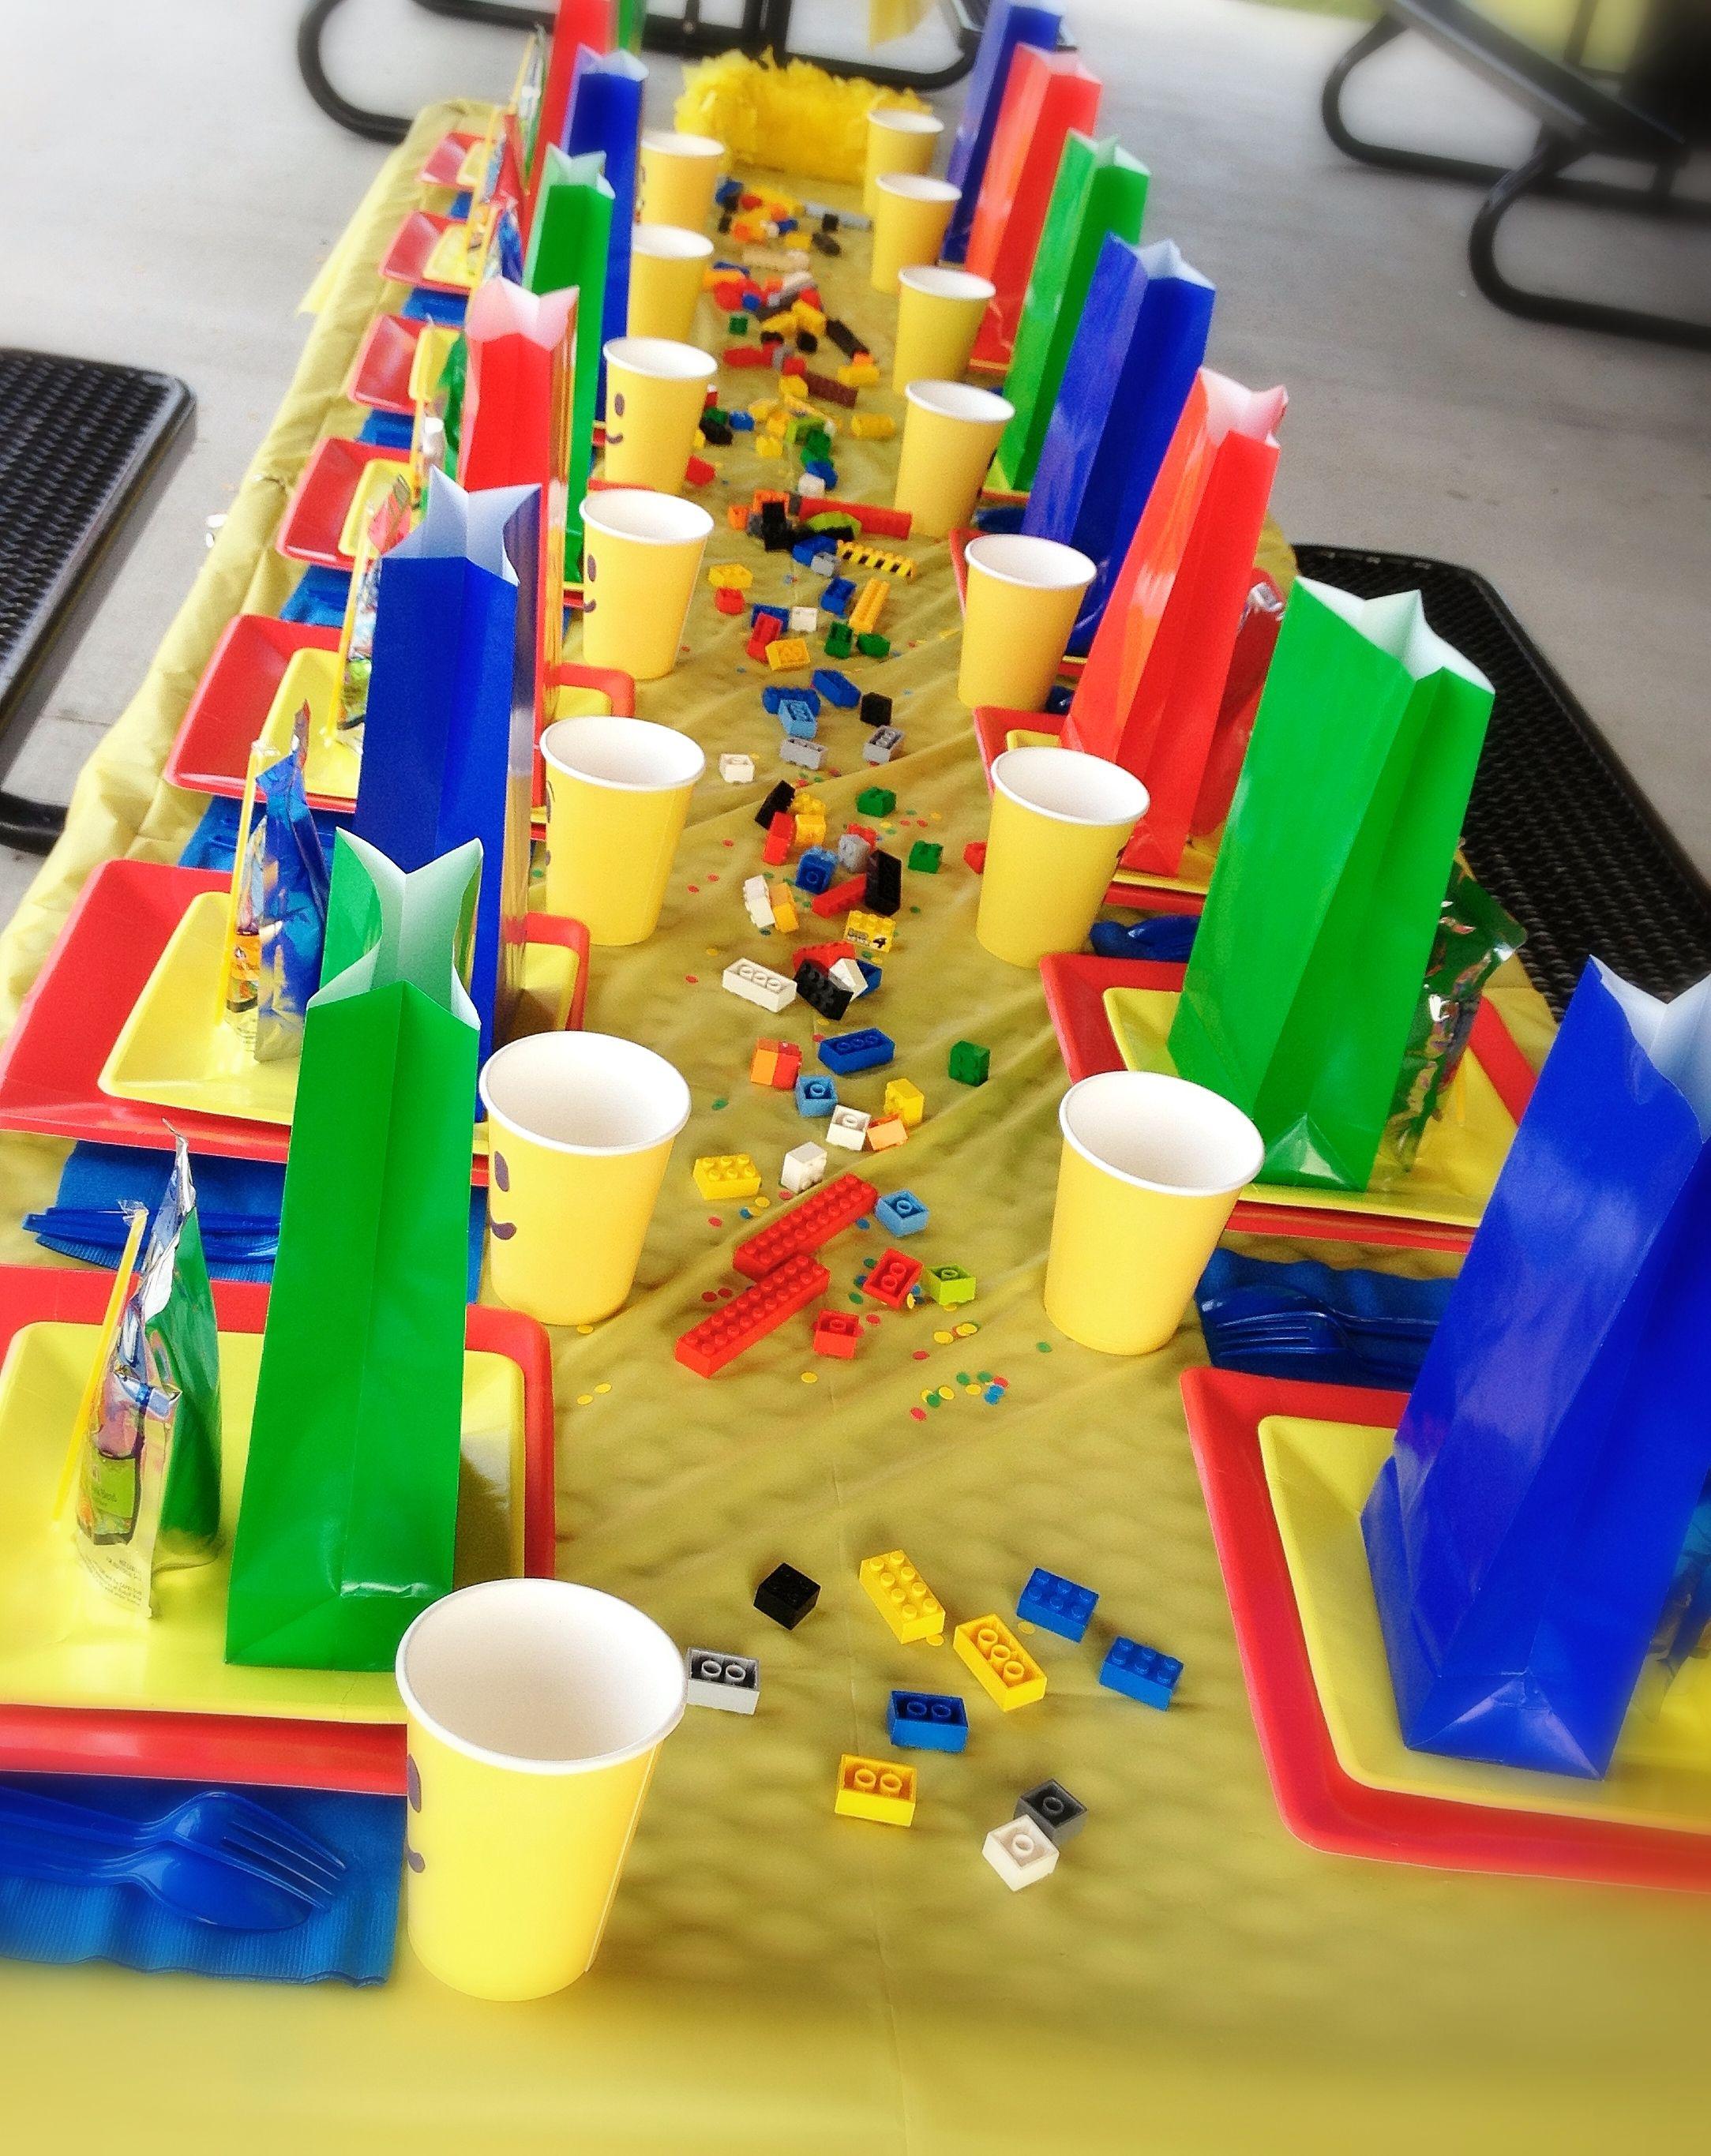 I Like The Cups And Lego On The Table Idea Lego Land